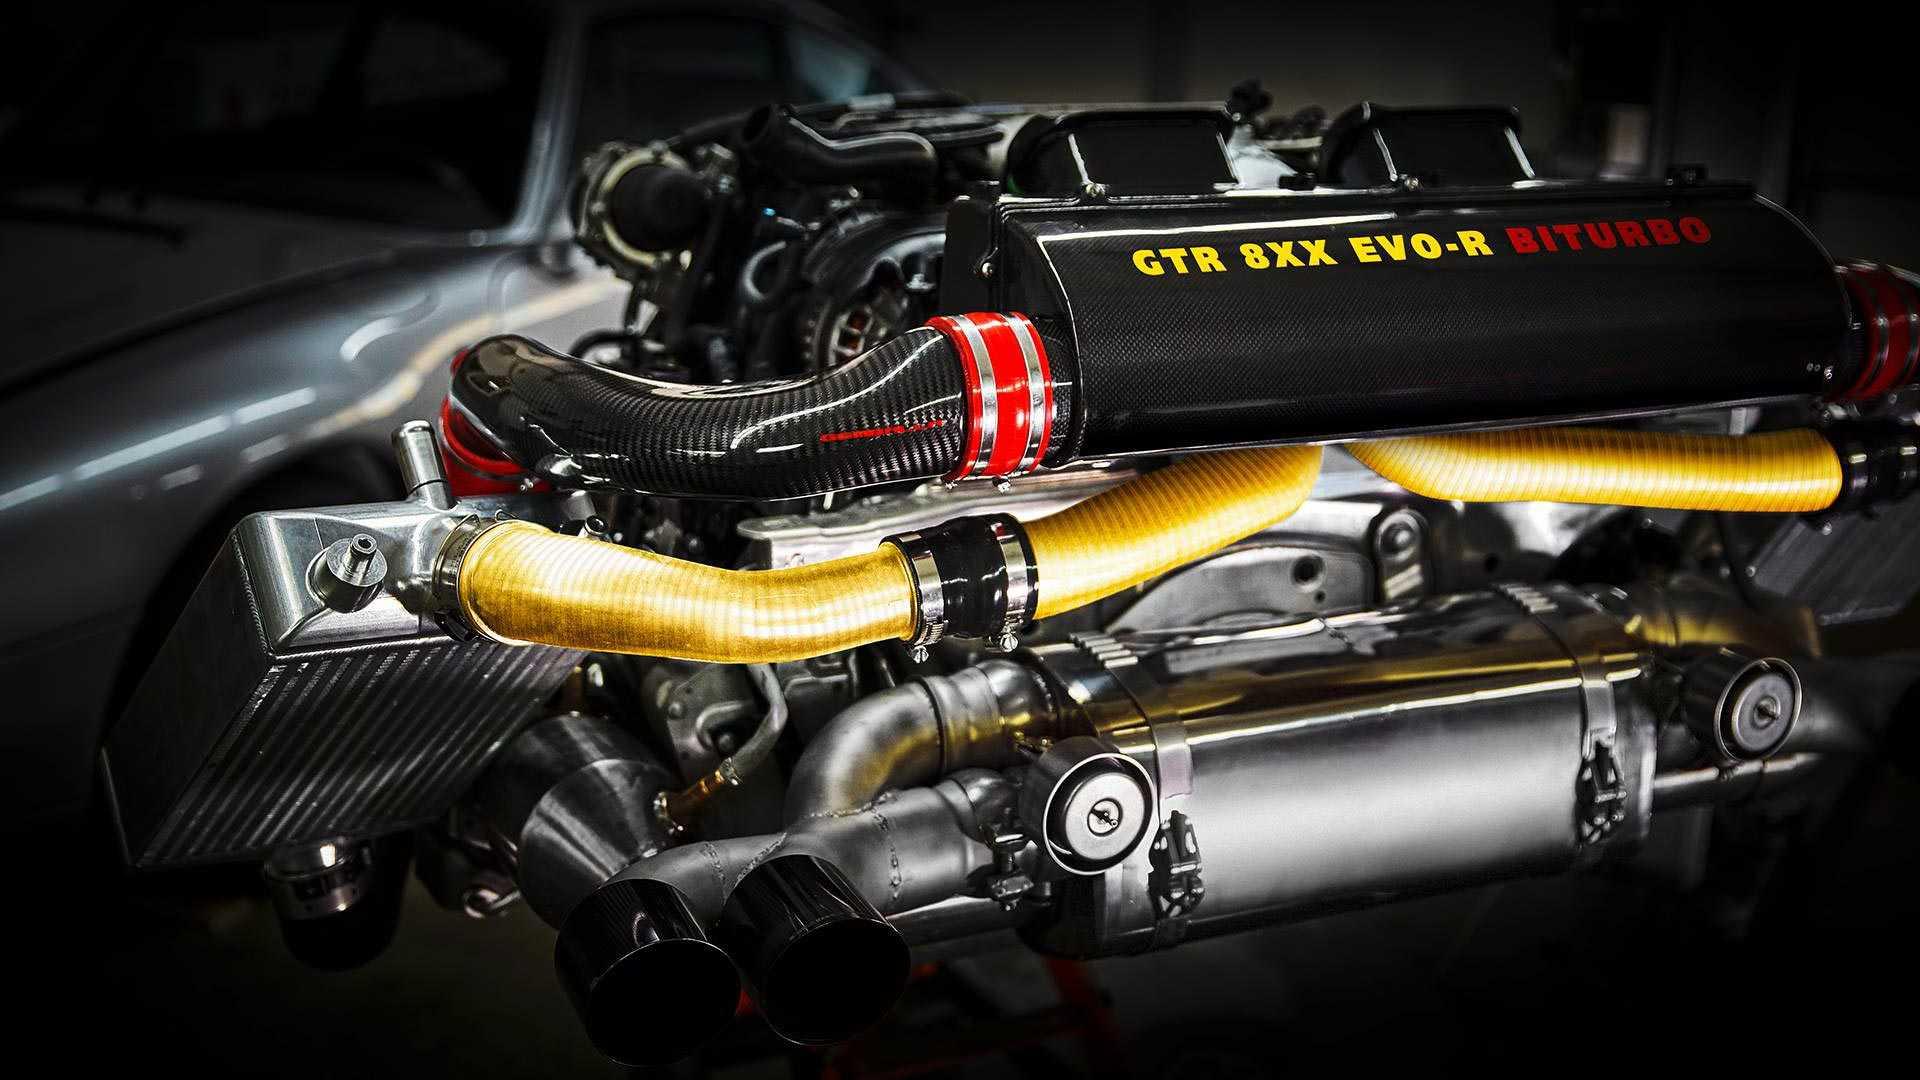 Porsche_911_Turbo_Gemballa-GTR_8XX_Evo-R_0002